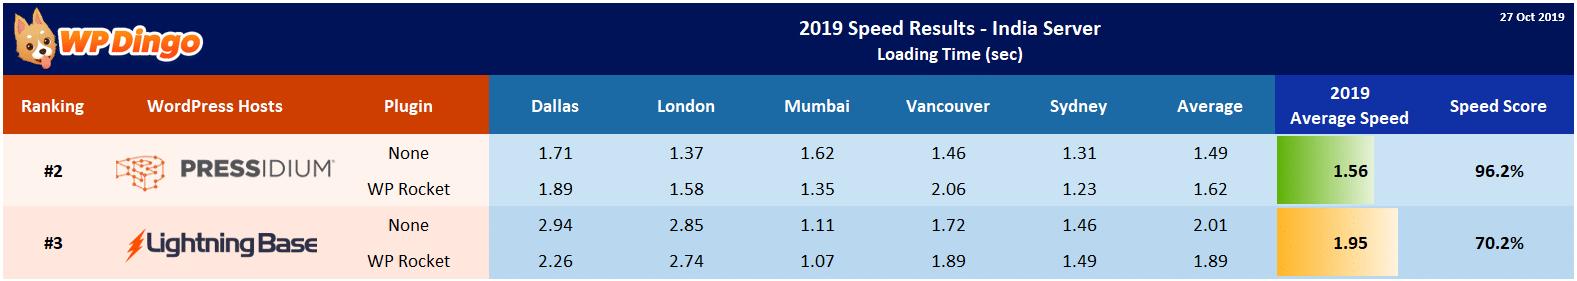 2019 Lightning Base vs Pressidium Speed Table - India Server